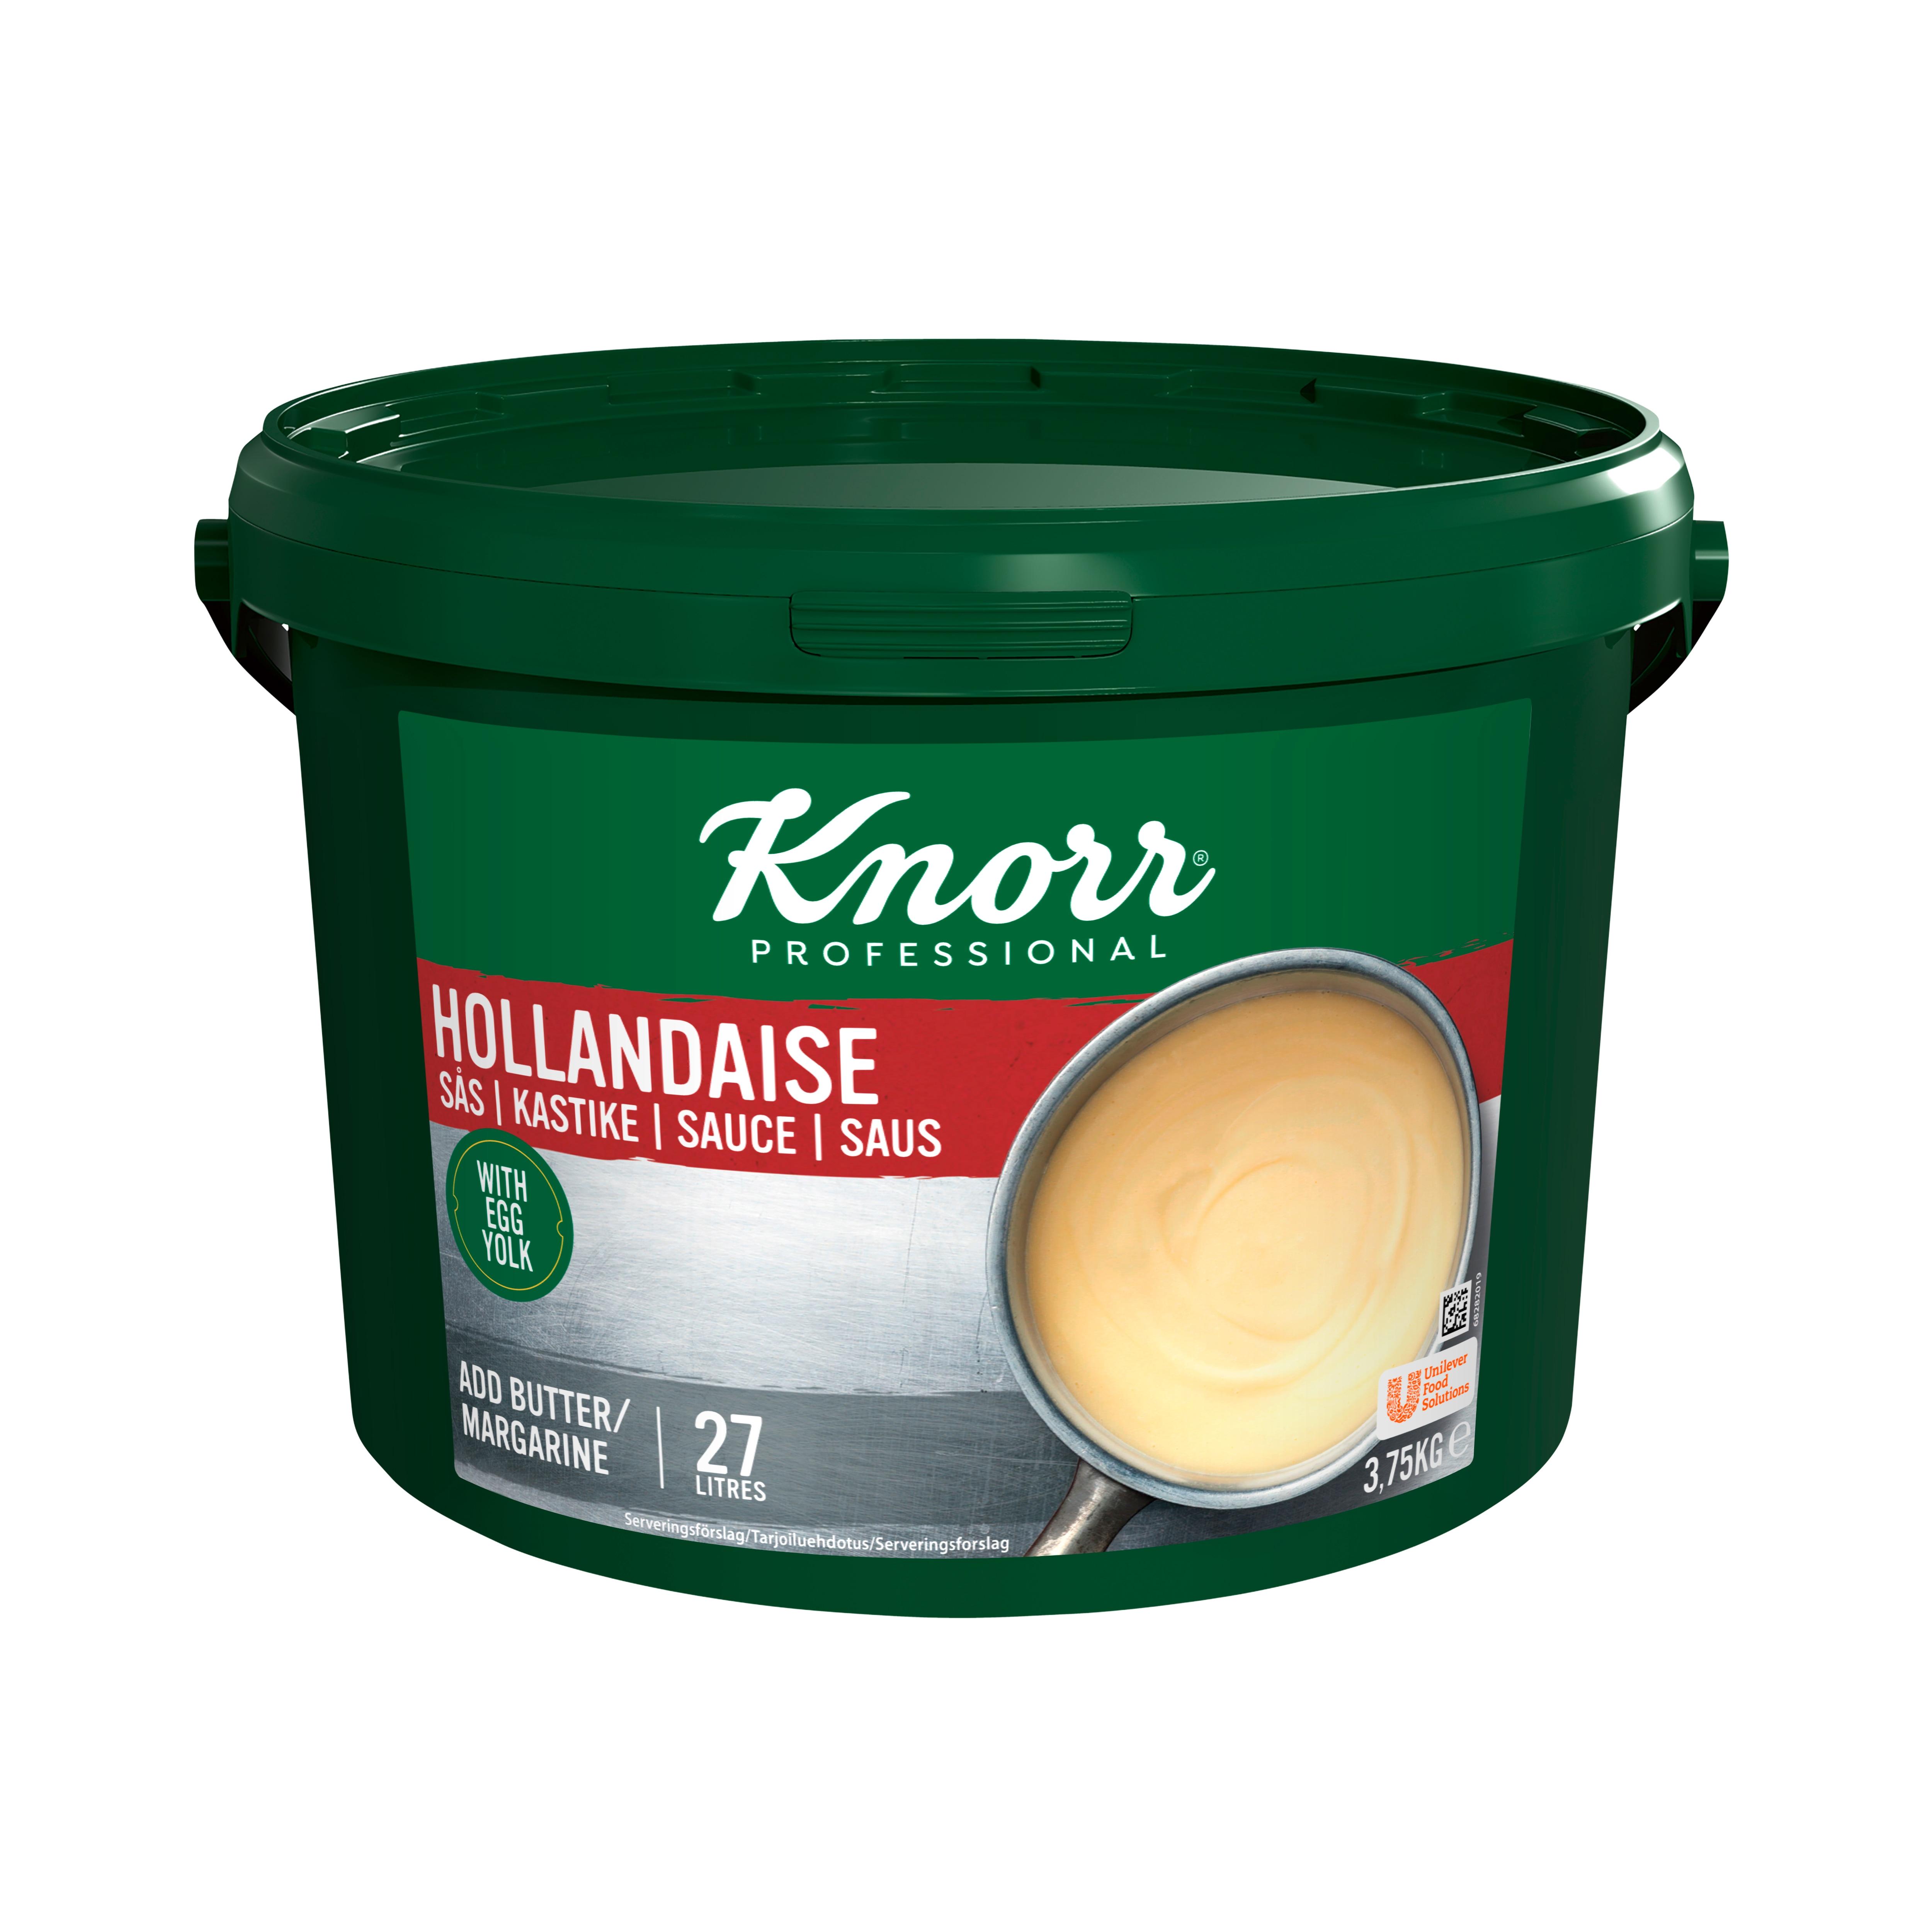 Knorr Hollandaisesaus 27L -